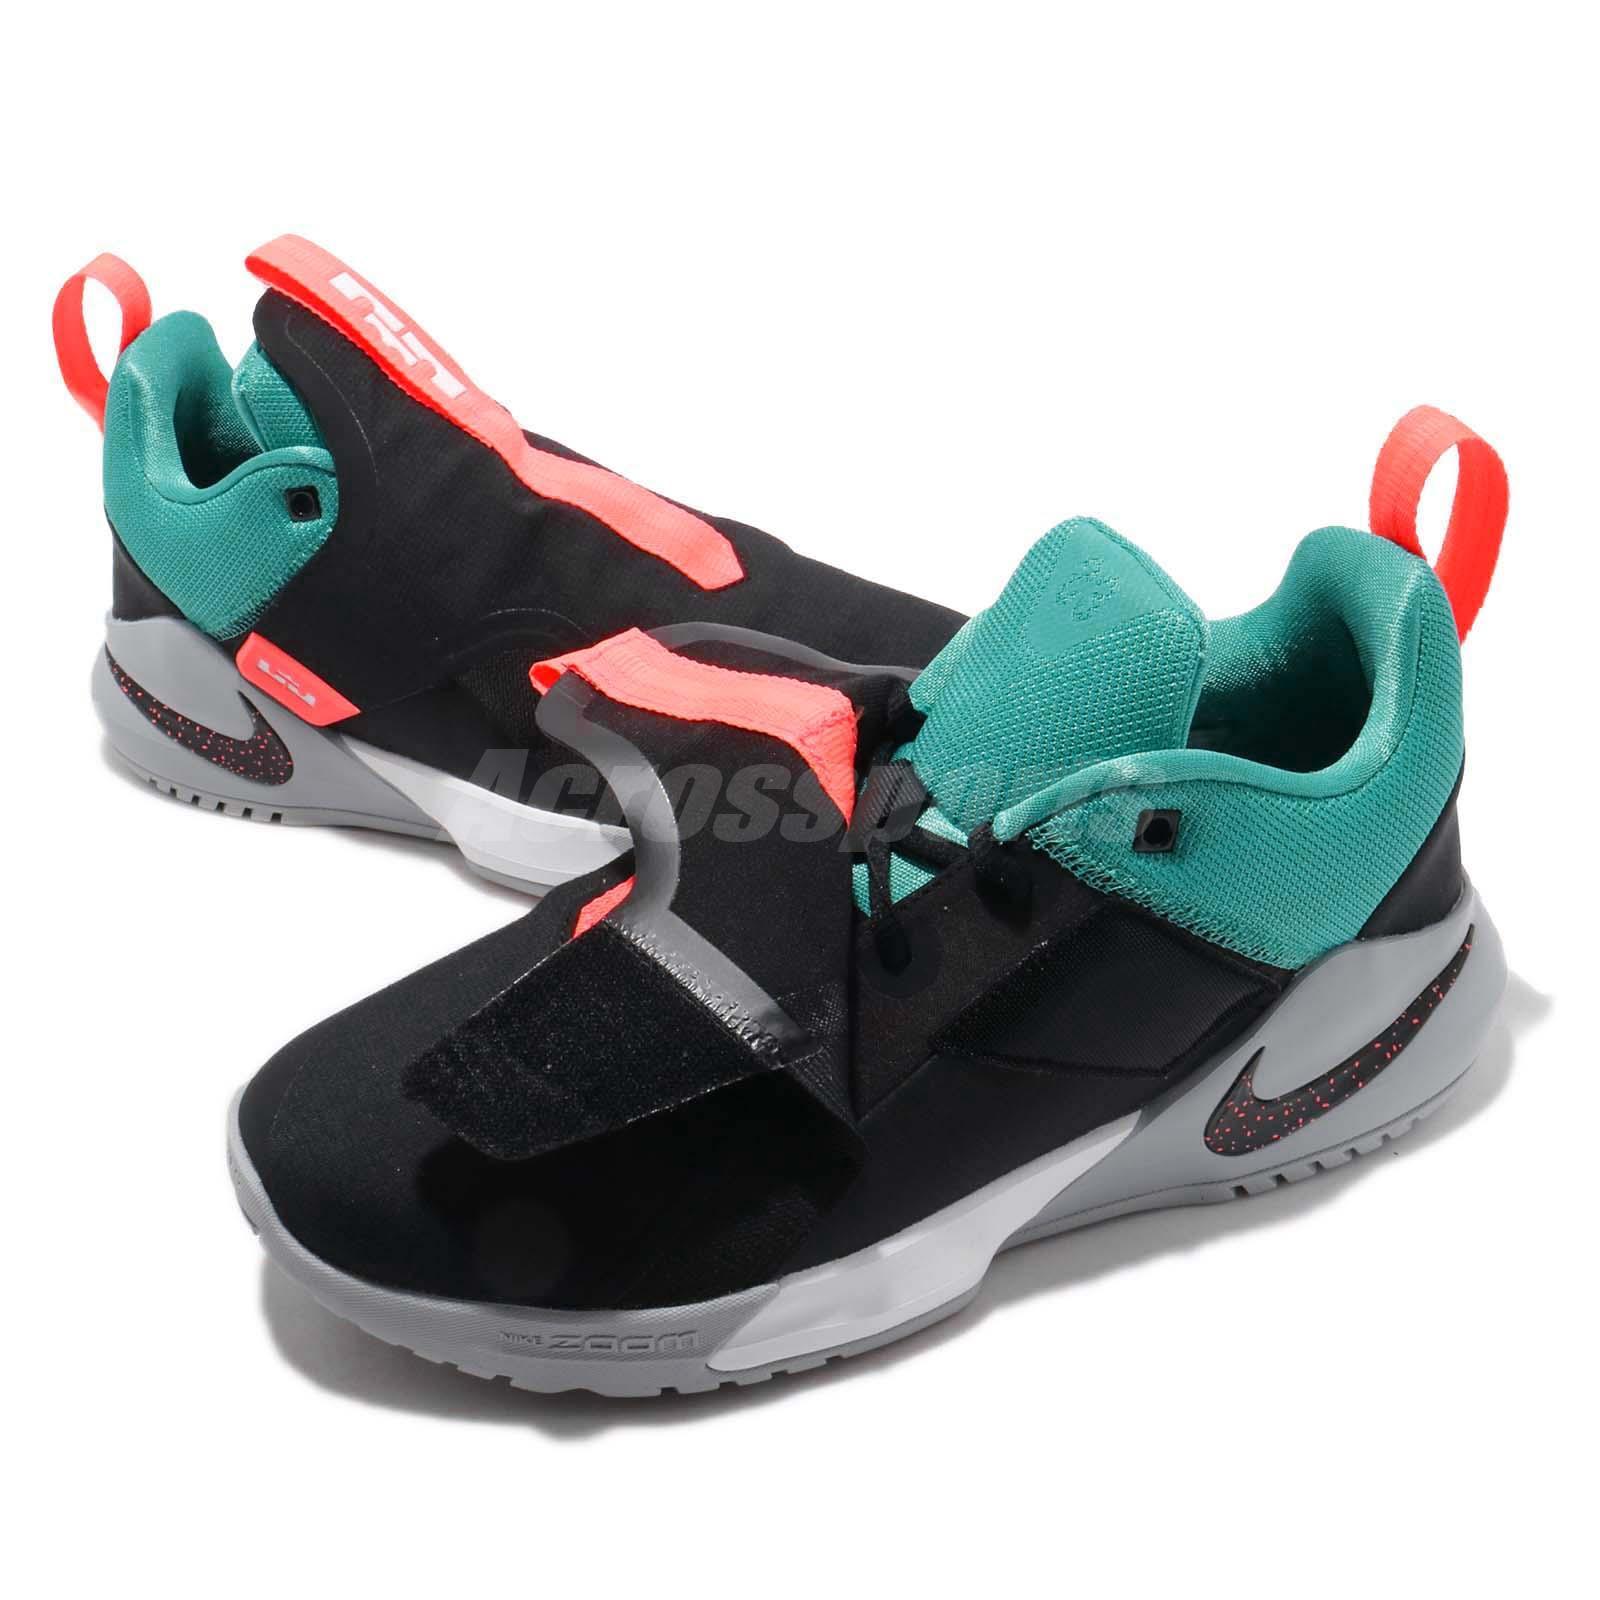 new product d23f4 70da8 Nike Ambassador XI 11 Lebron James Black Cabana Men Basketball Shoes ...